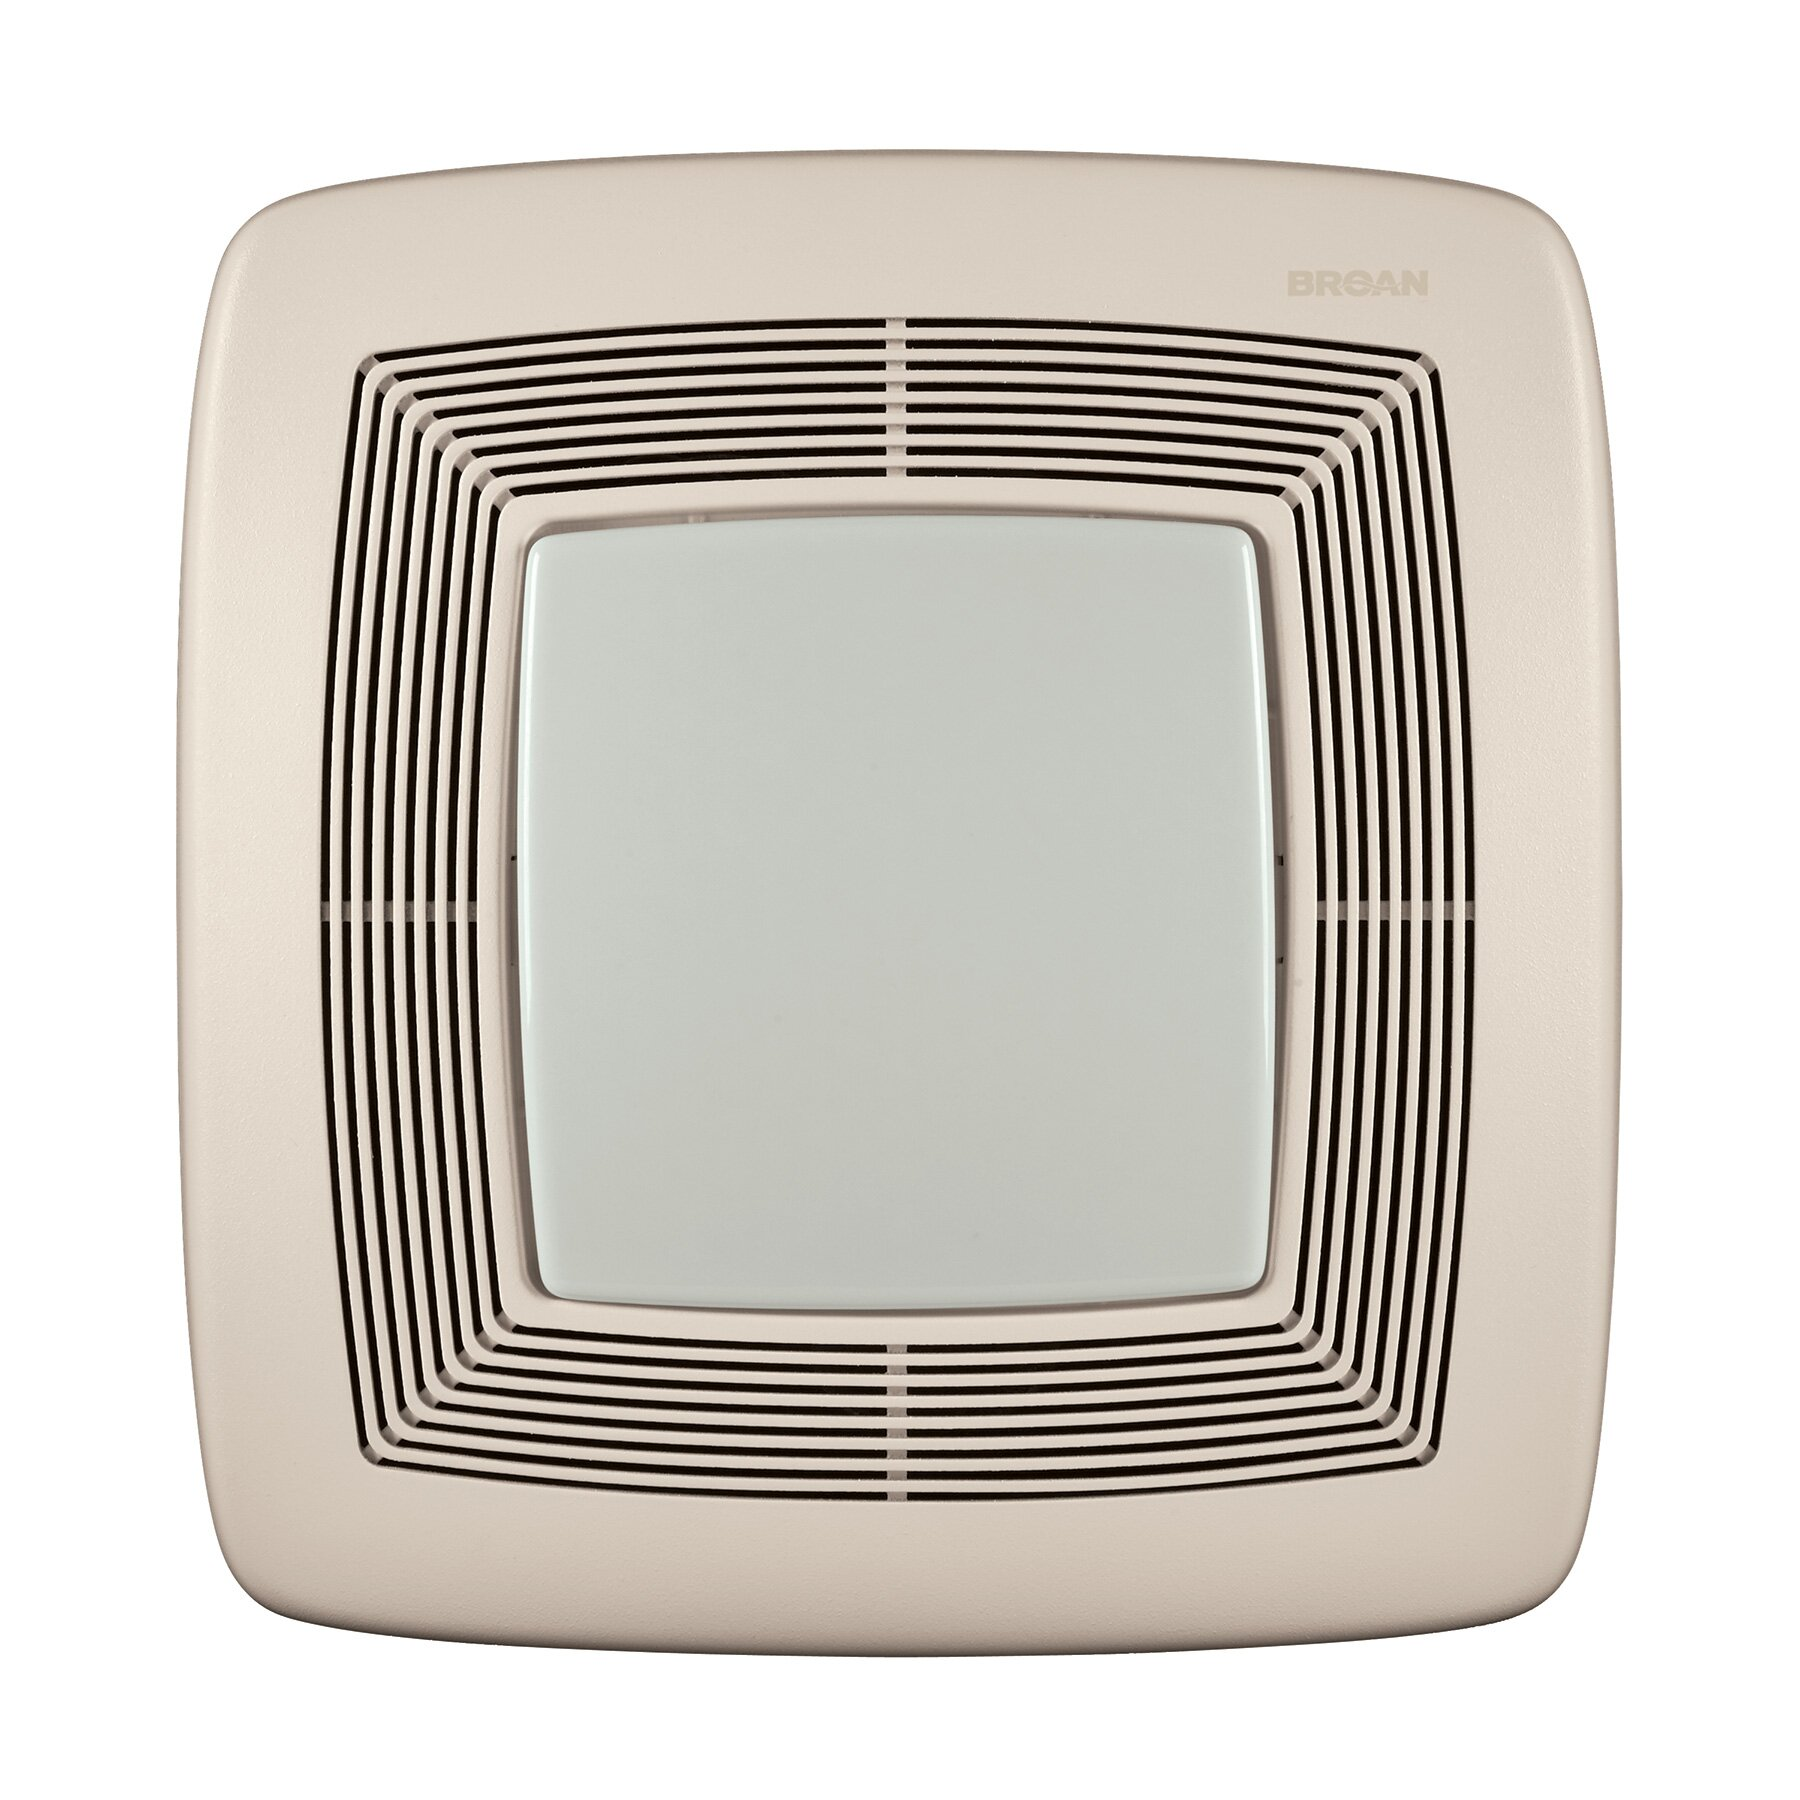 Broan 110 CFM Energy Star Bathroom Fan with Light ...